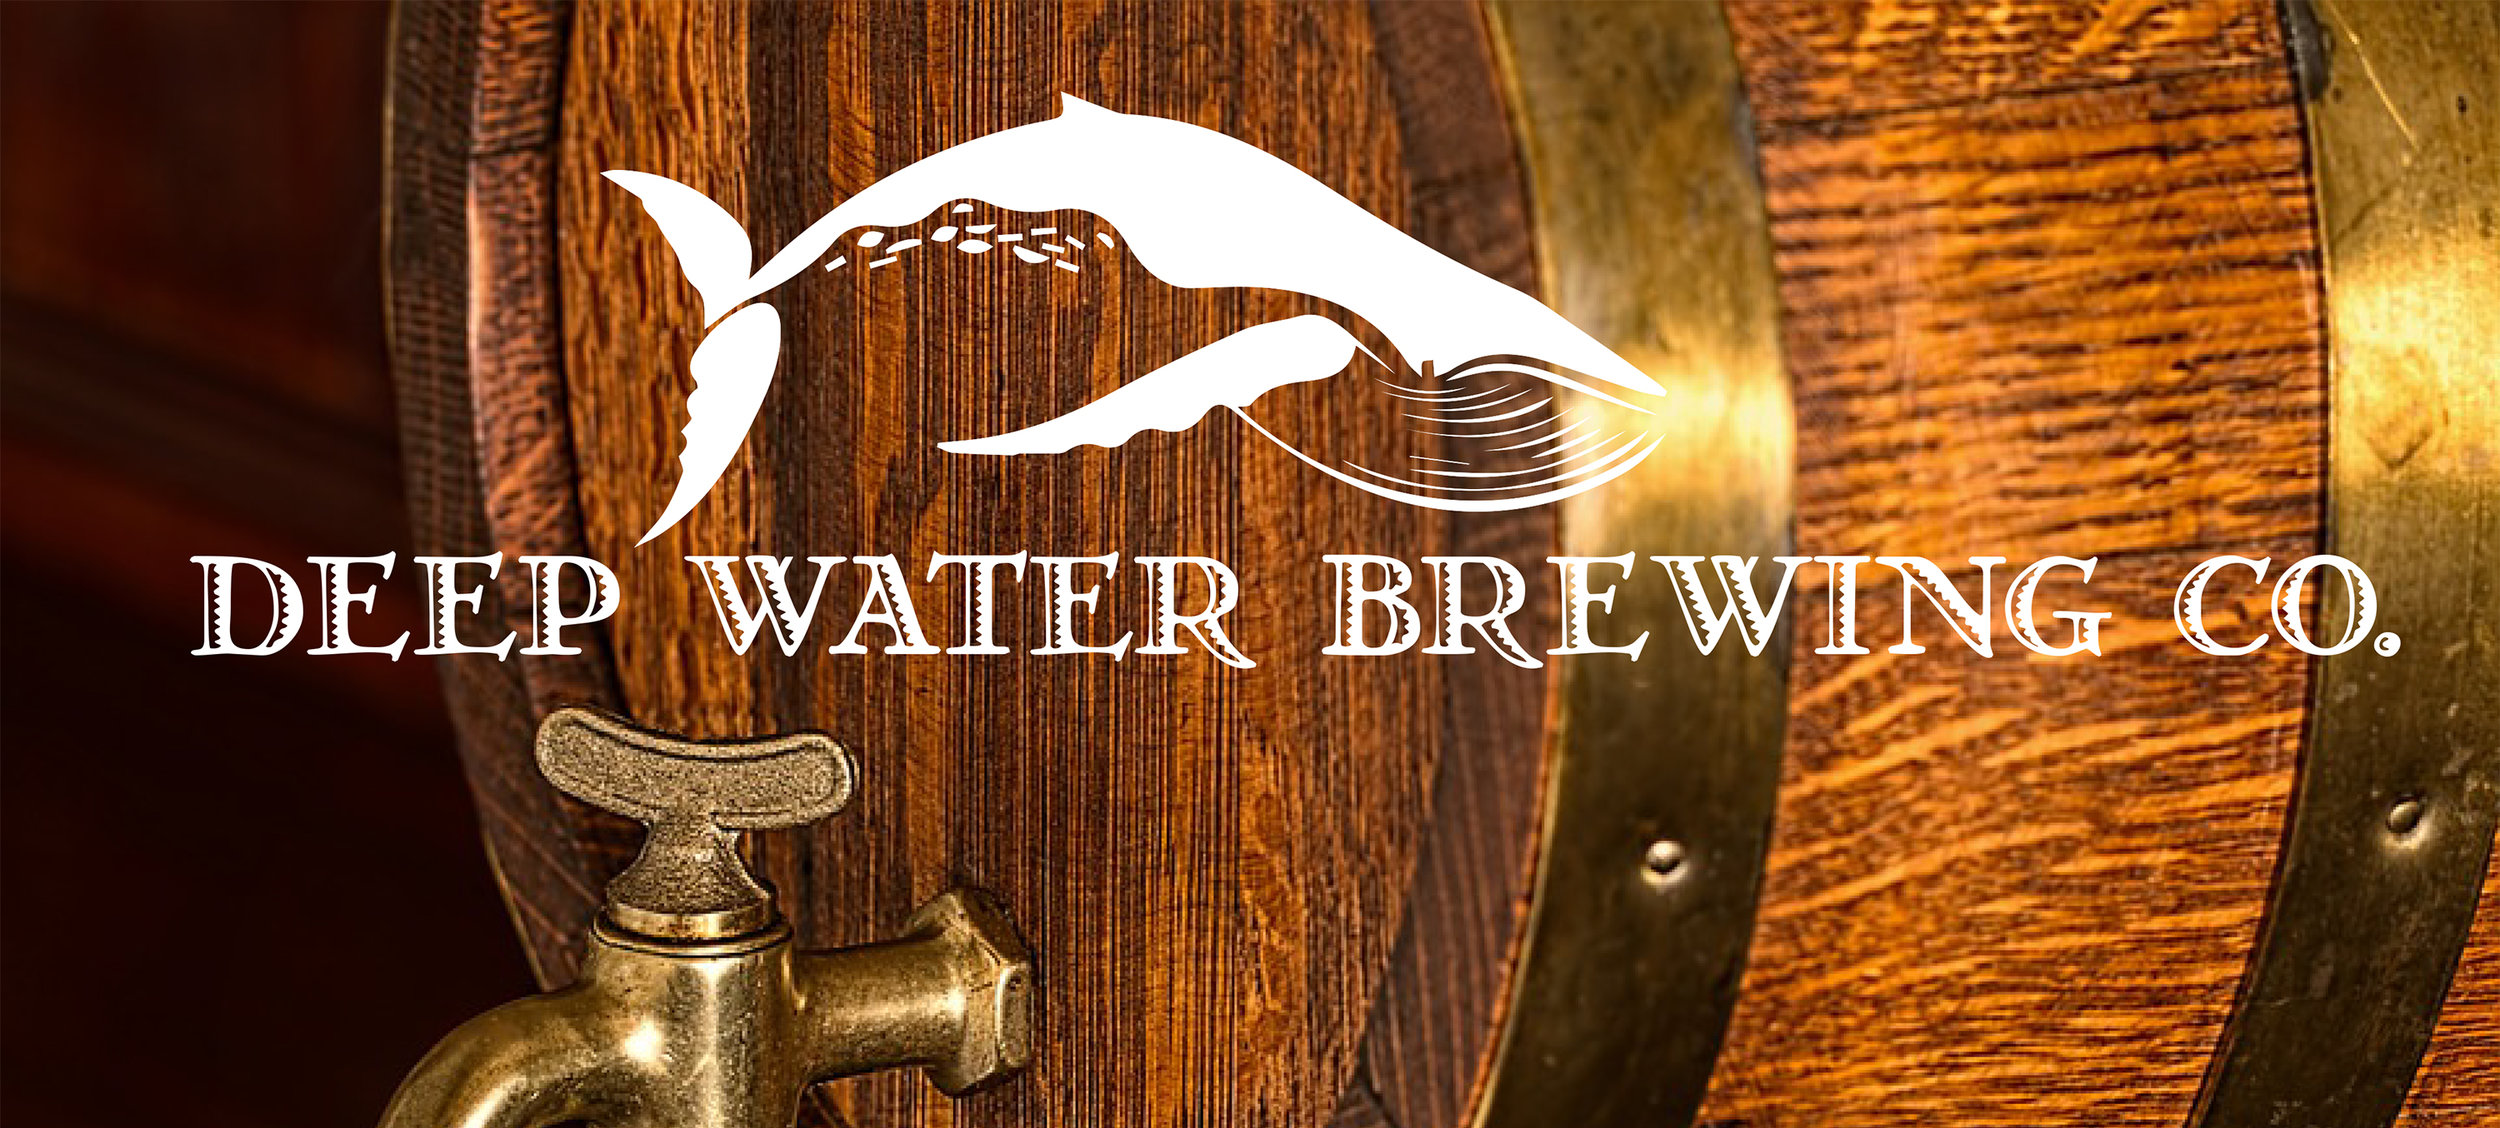 Deepwater Brew Pub main image banner.jpg